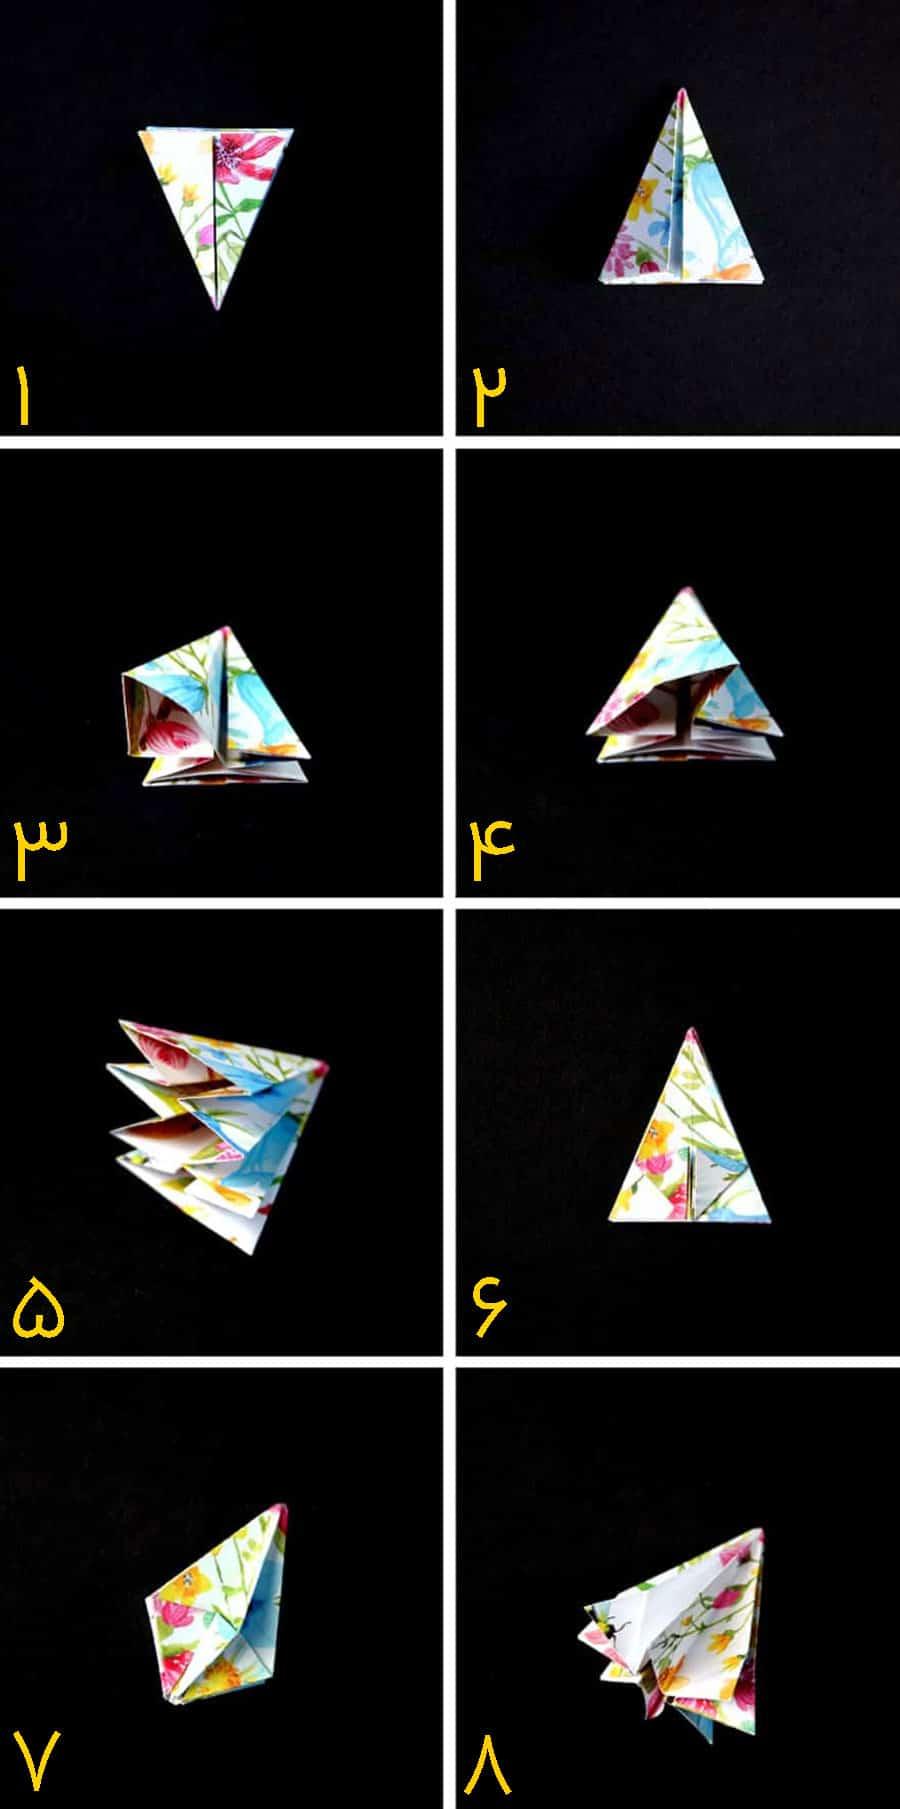 13 قدم تا ساخت اوریگامی الماس